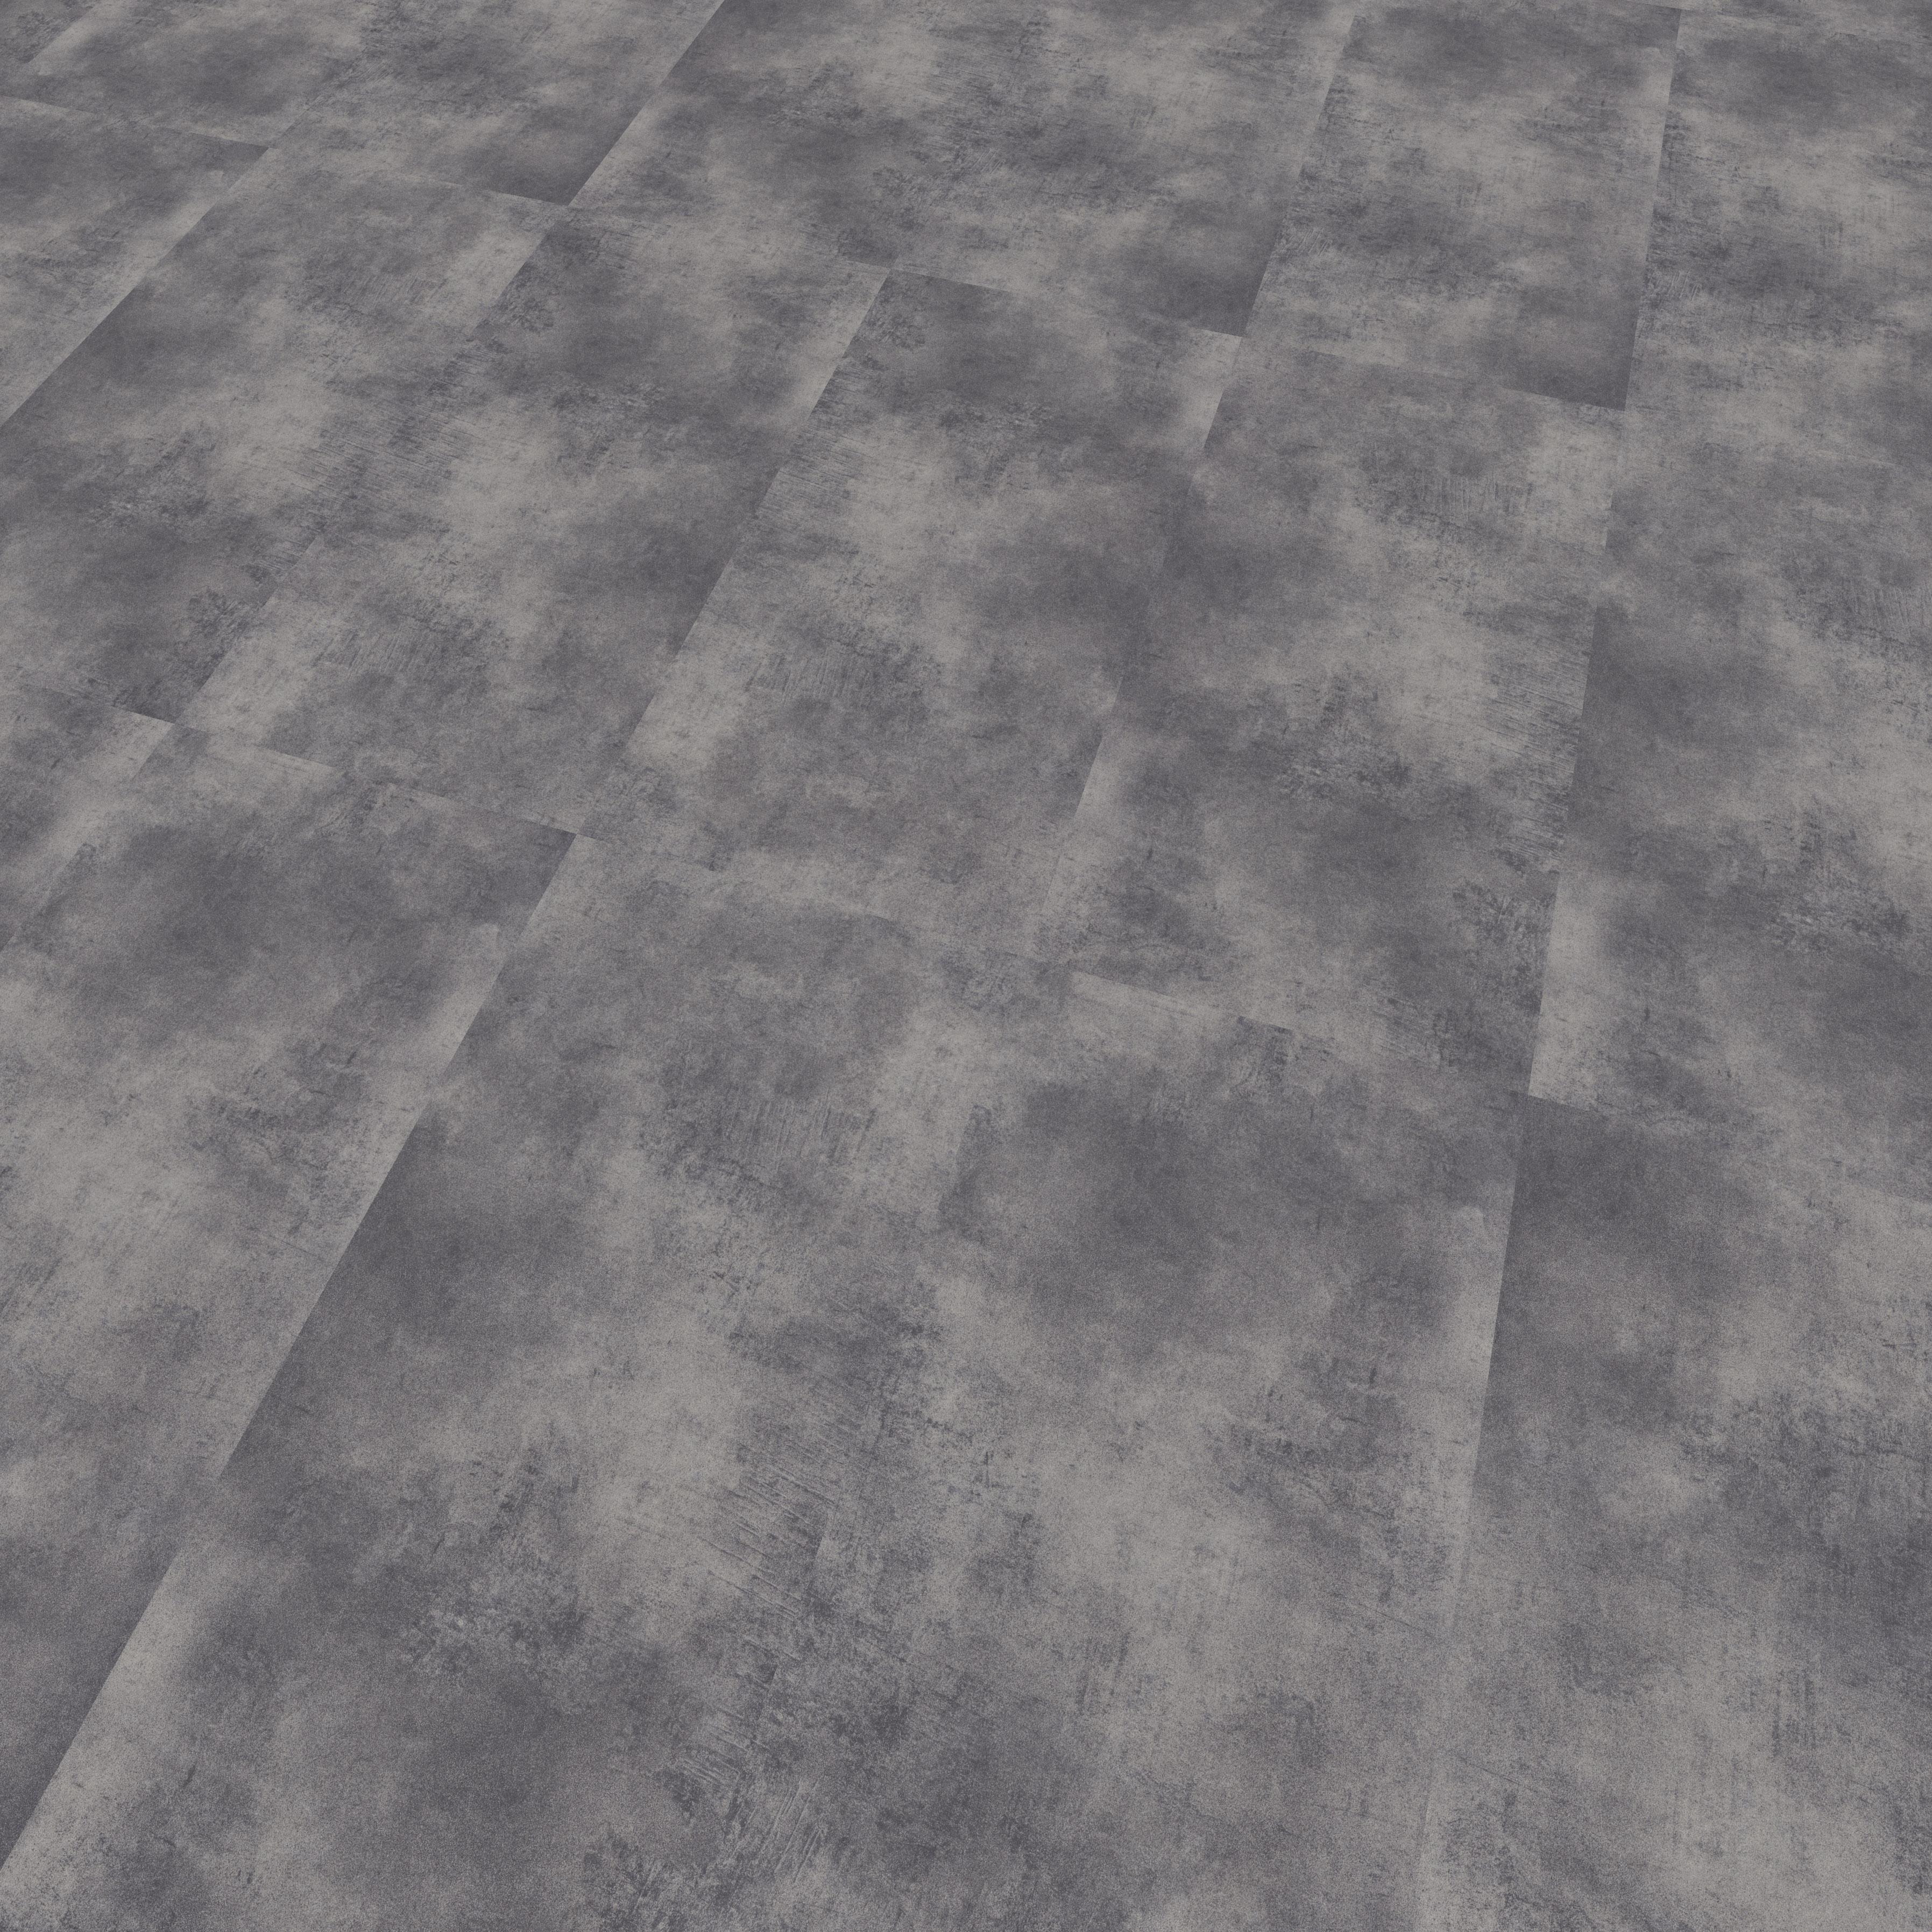 Grey Line Image